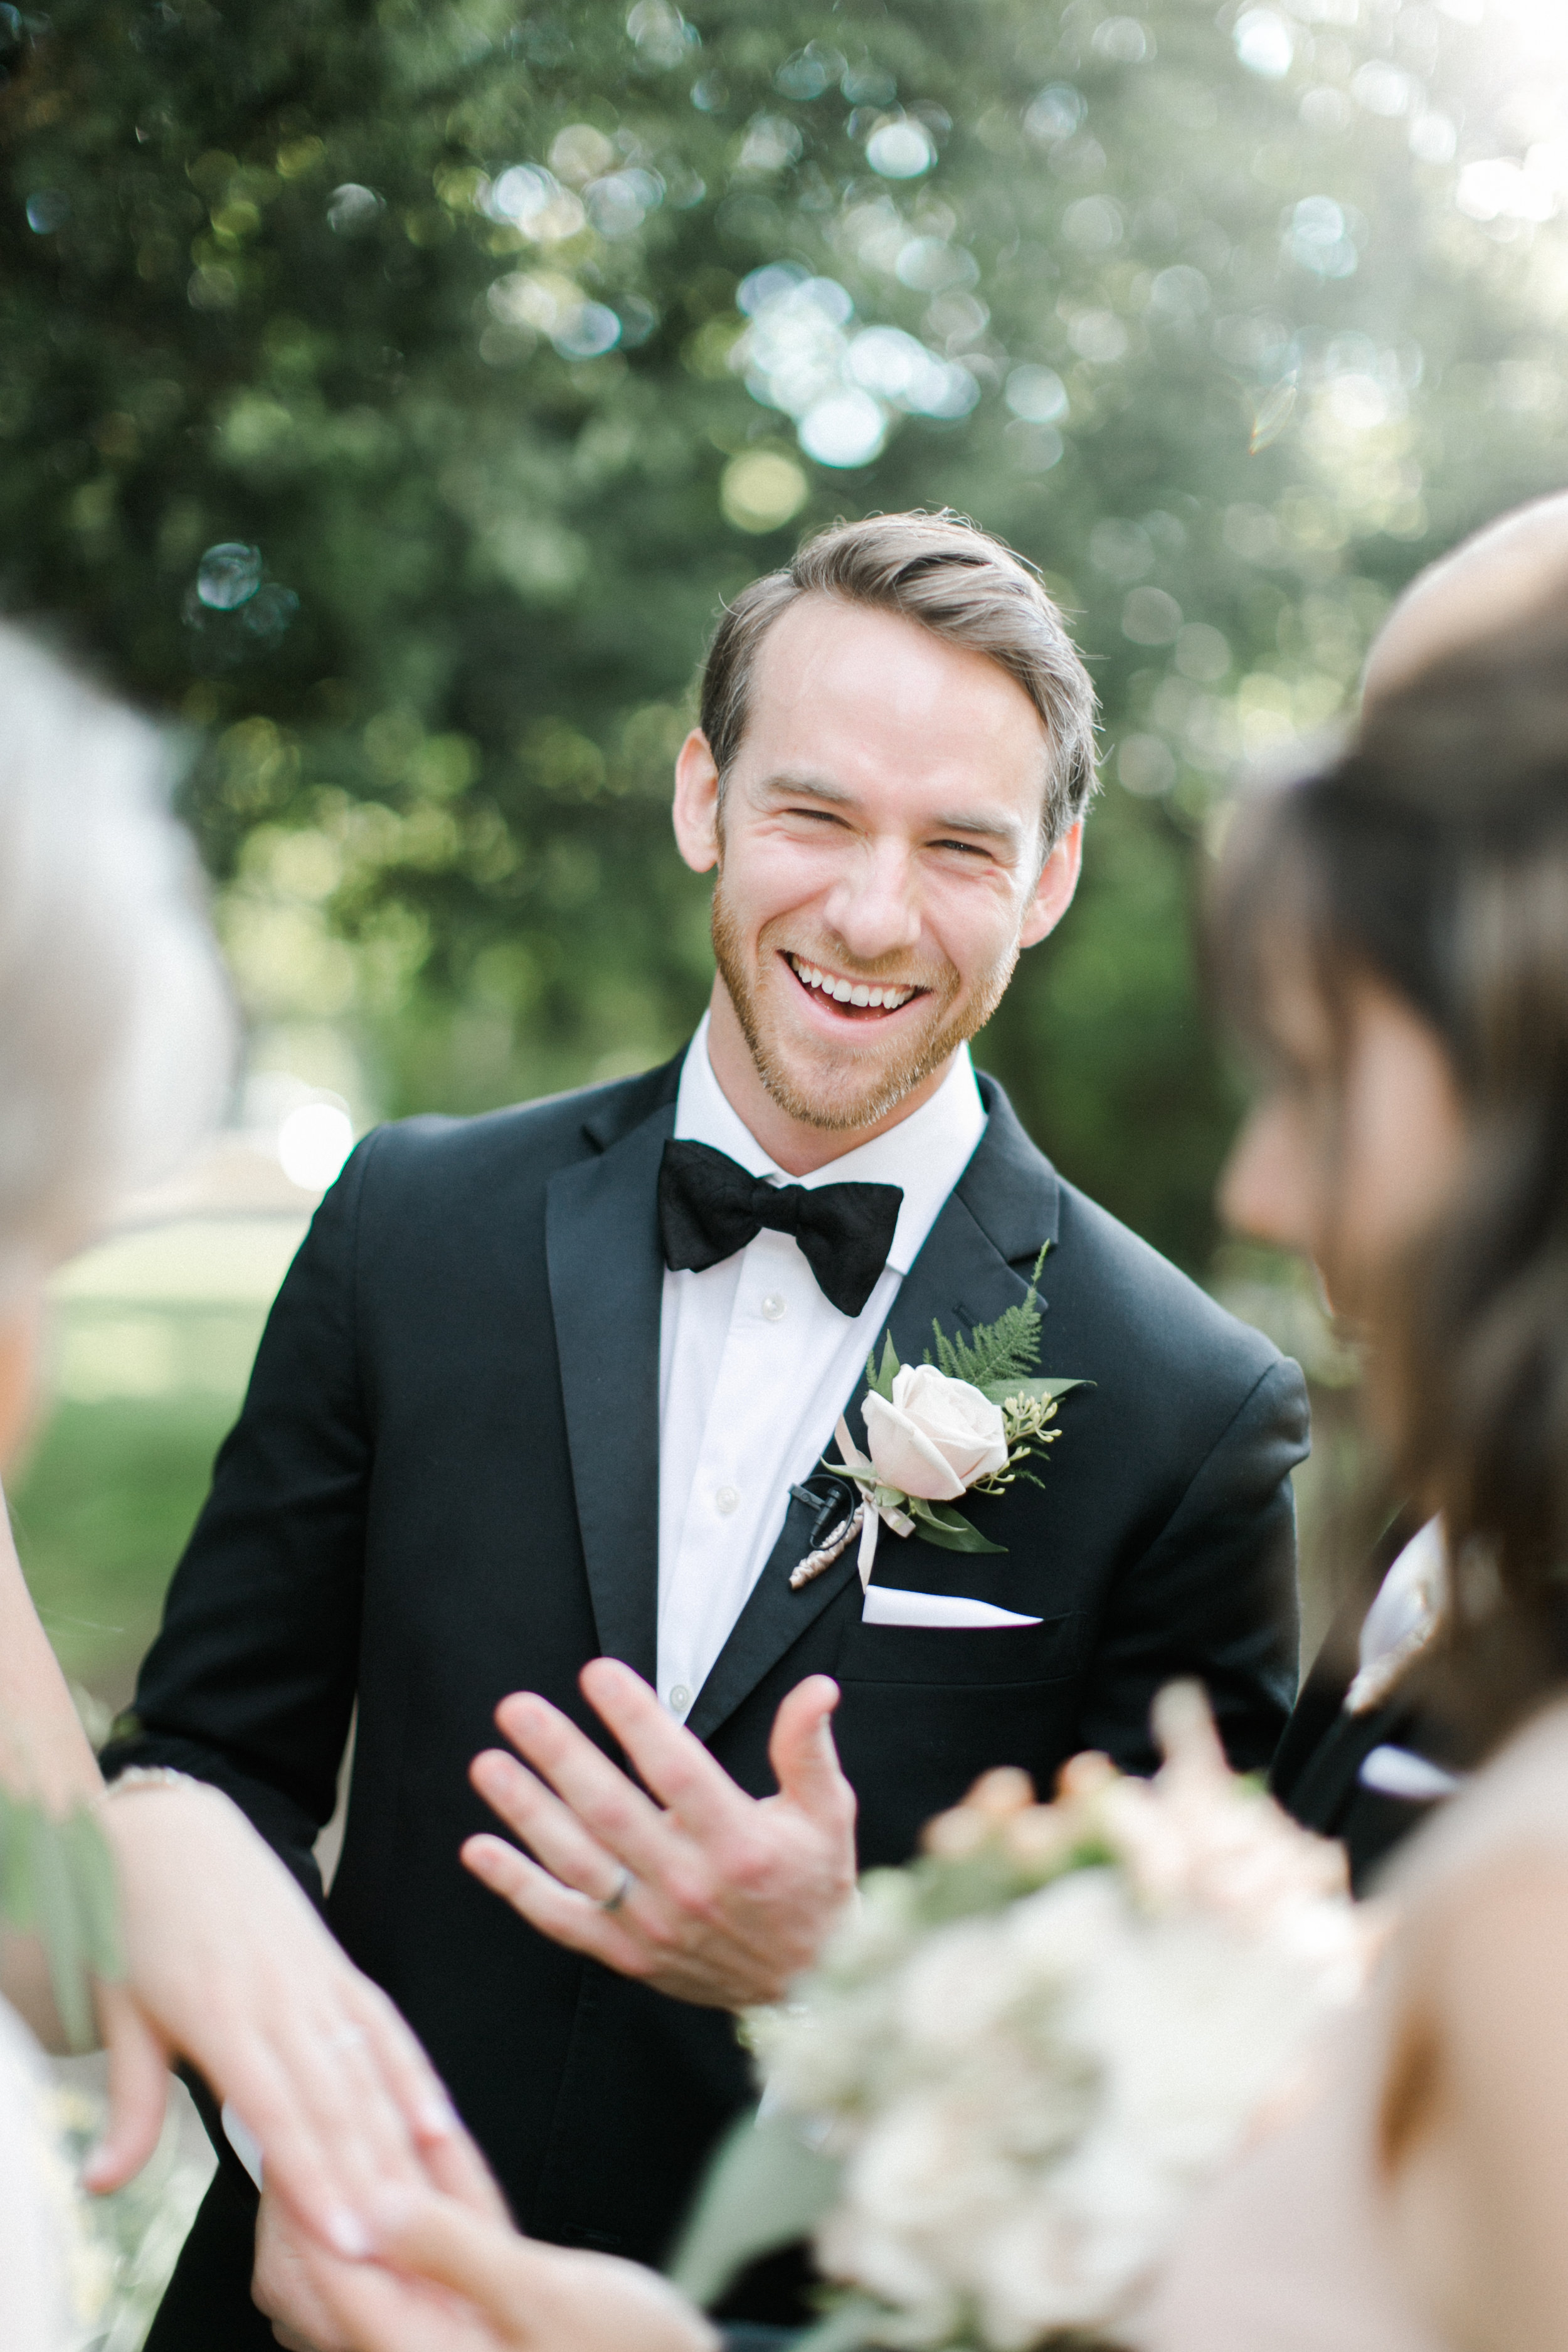 best-toronto-wedding-photographer-sunnybrook-estate-mclean-house-richelle-hunter-emily-geoff-631.jpg